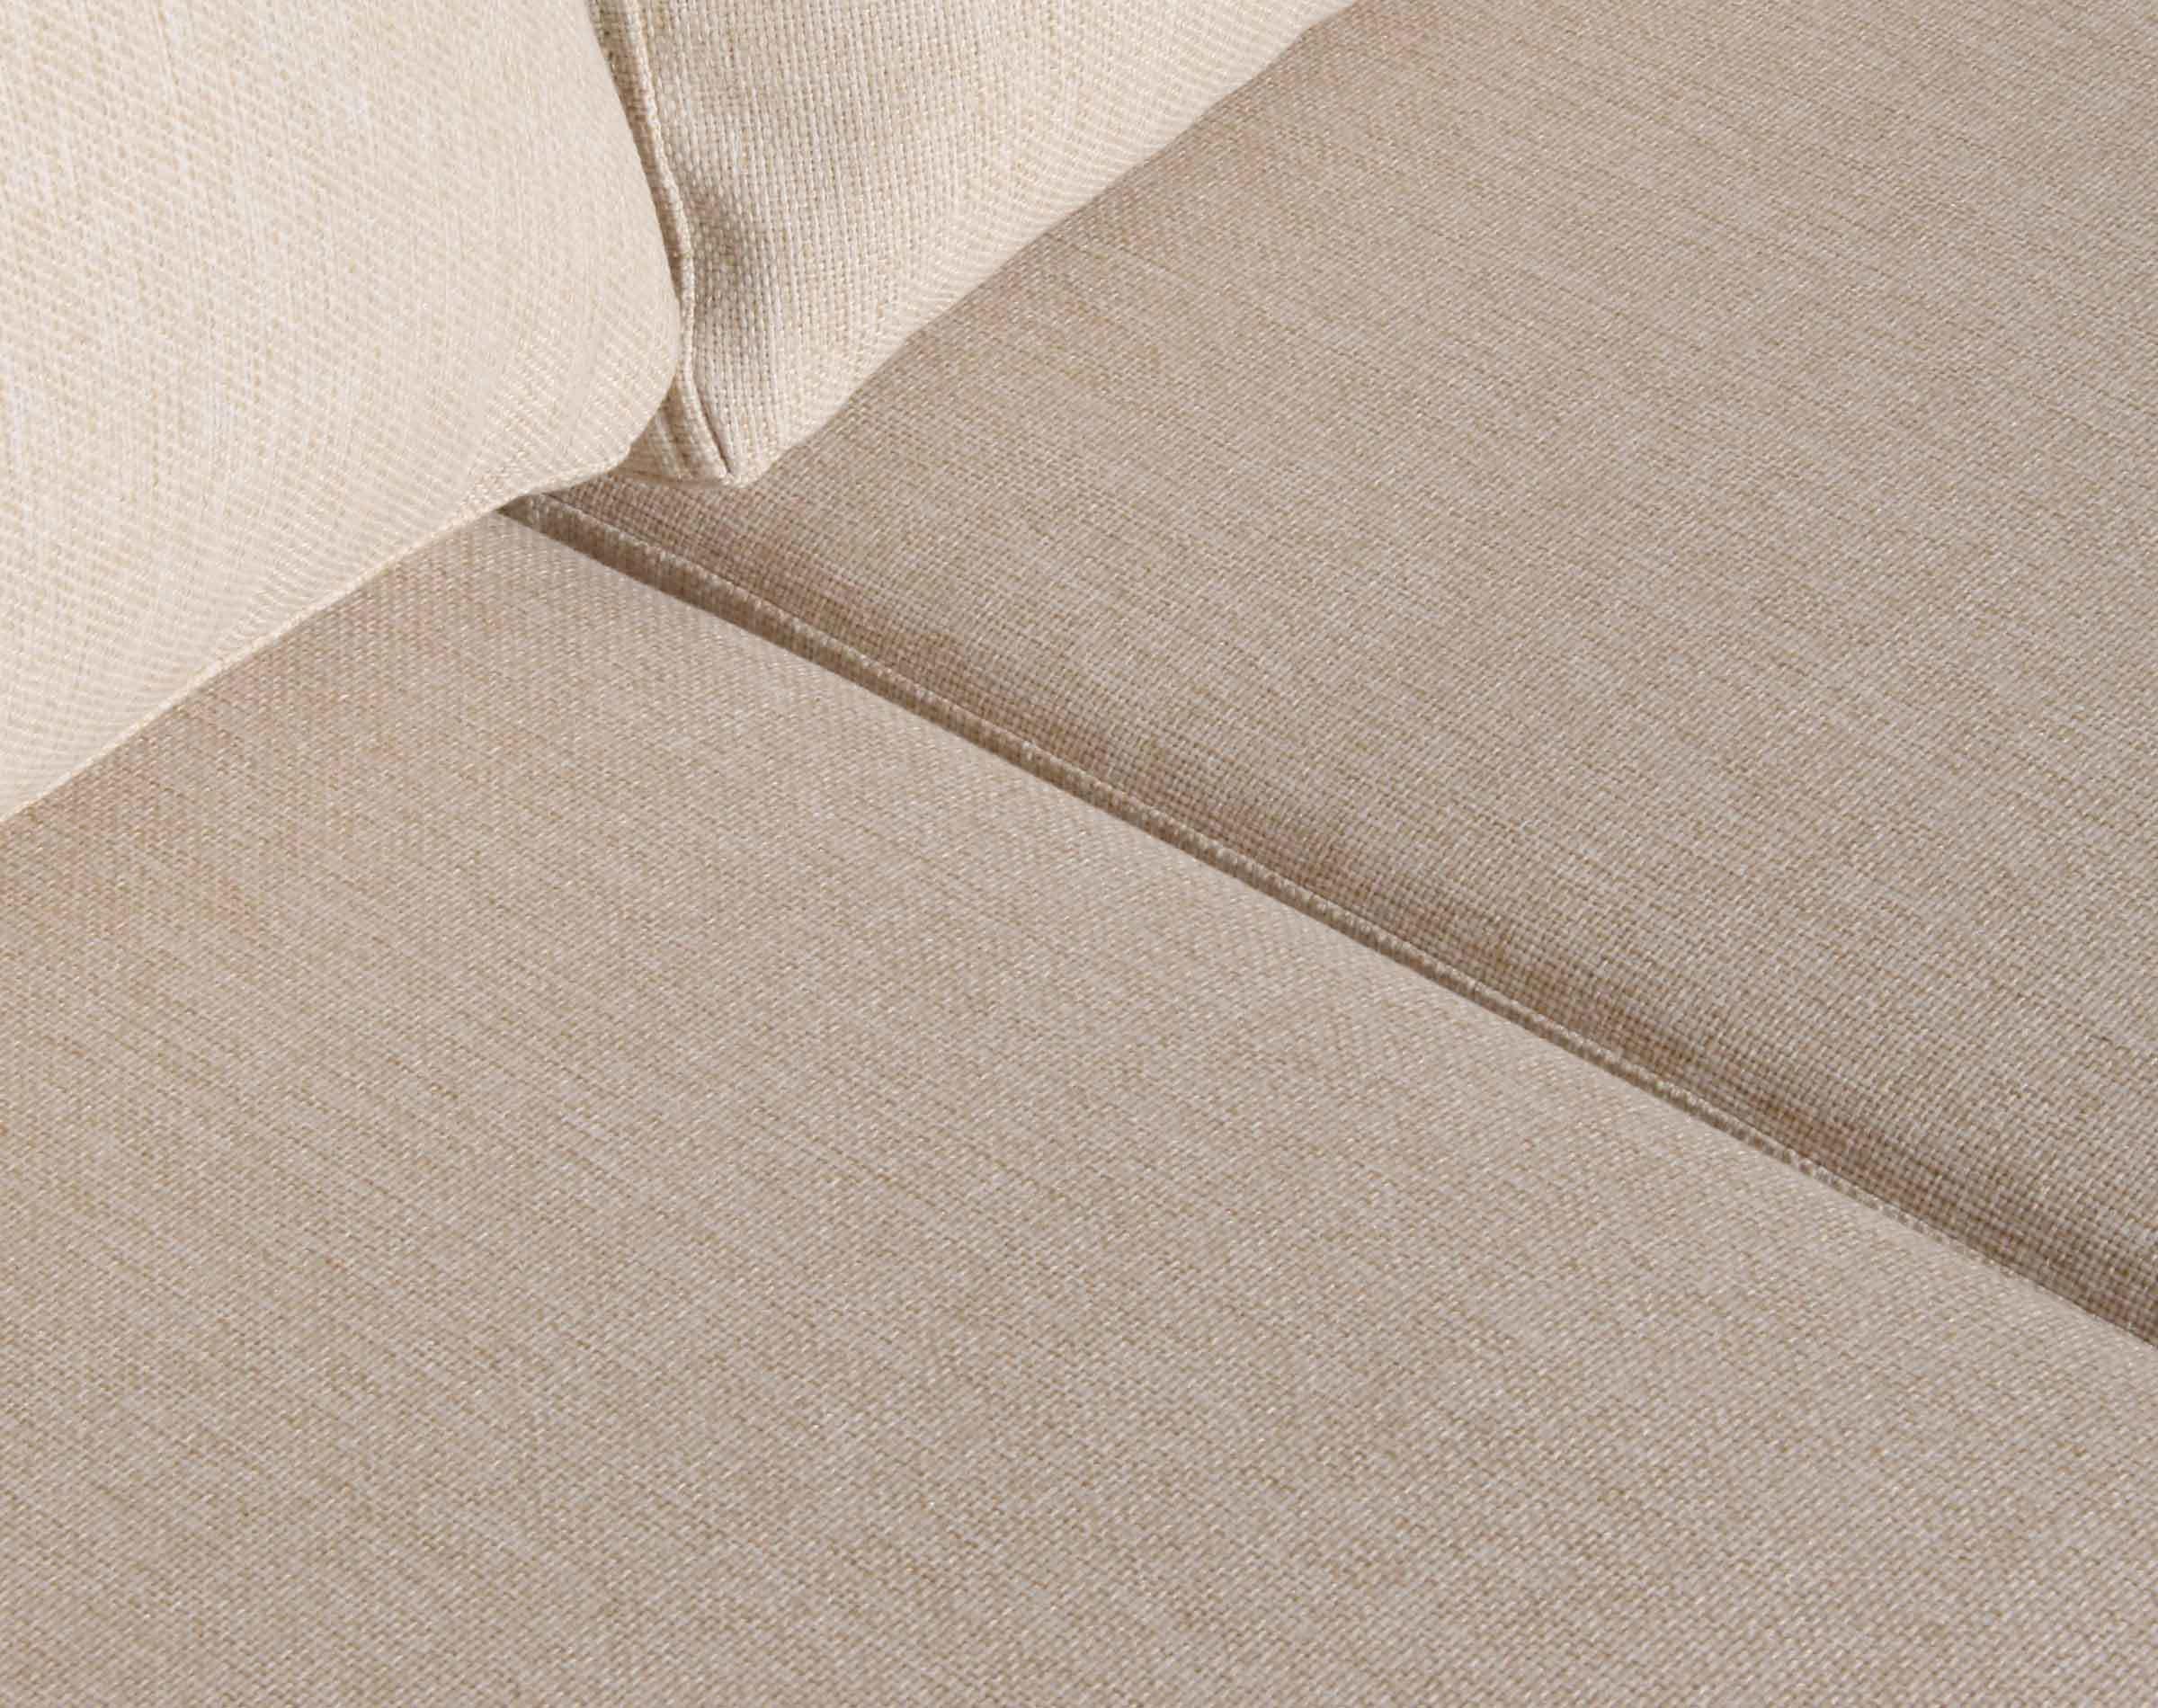 Sofa seccional Tai derecho tapiz XSD beige